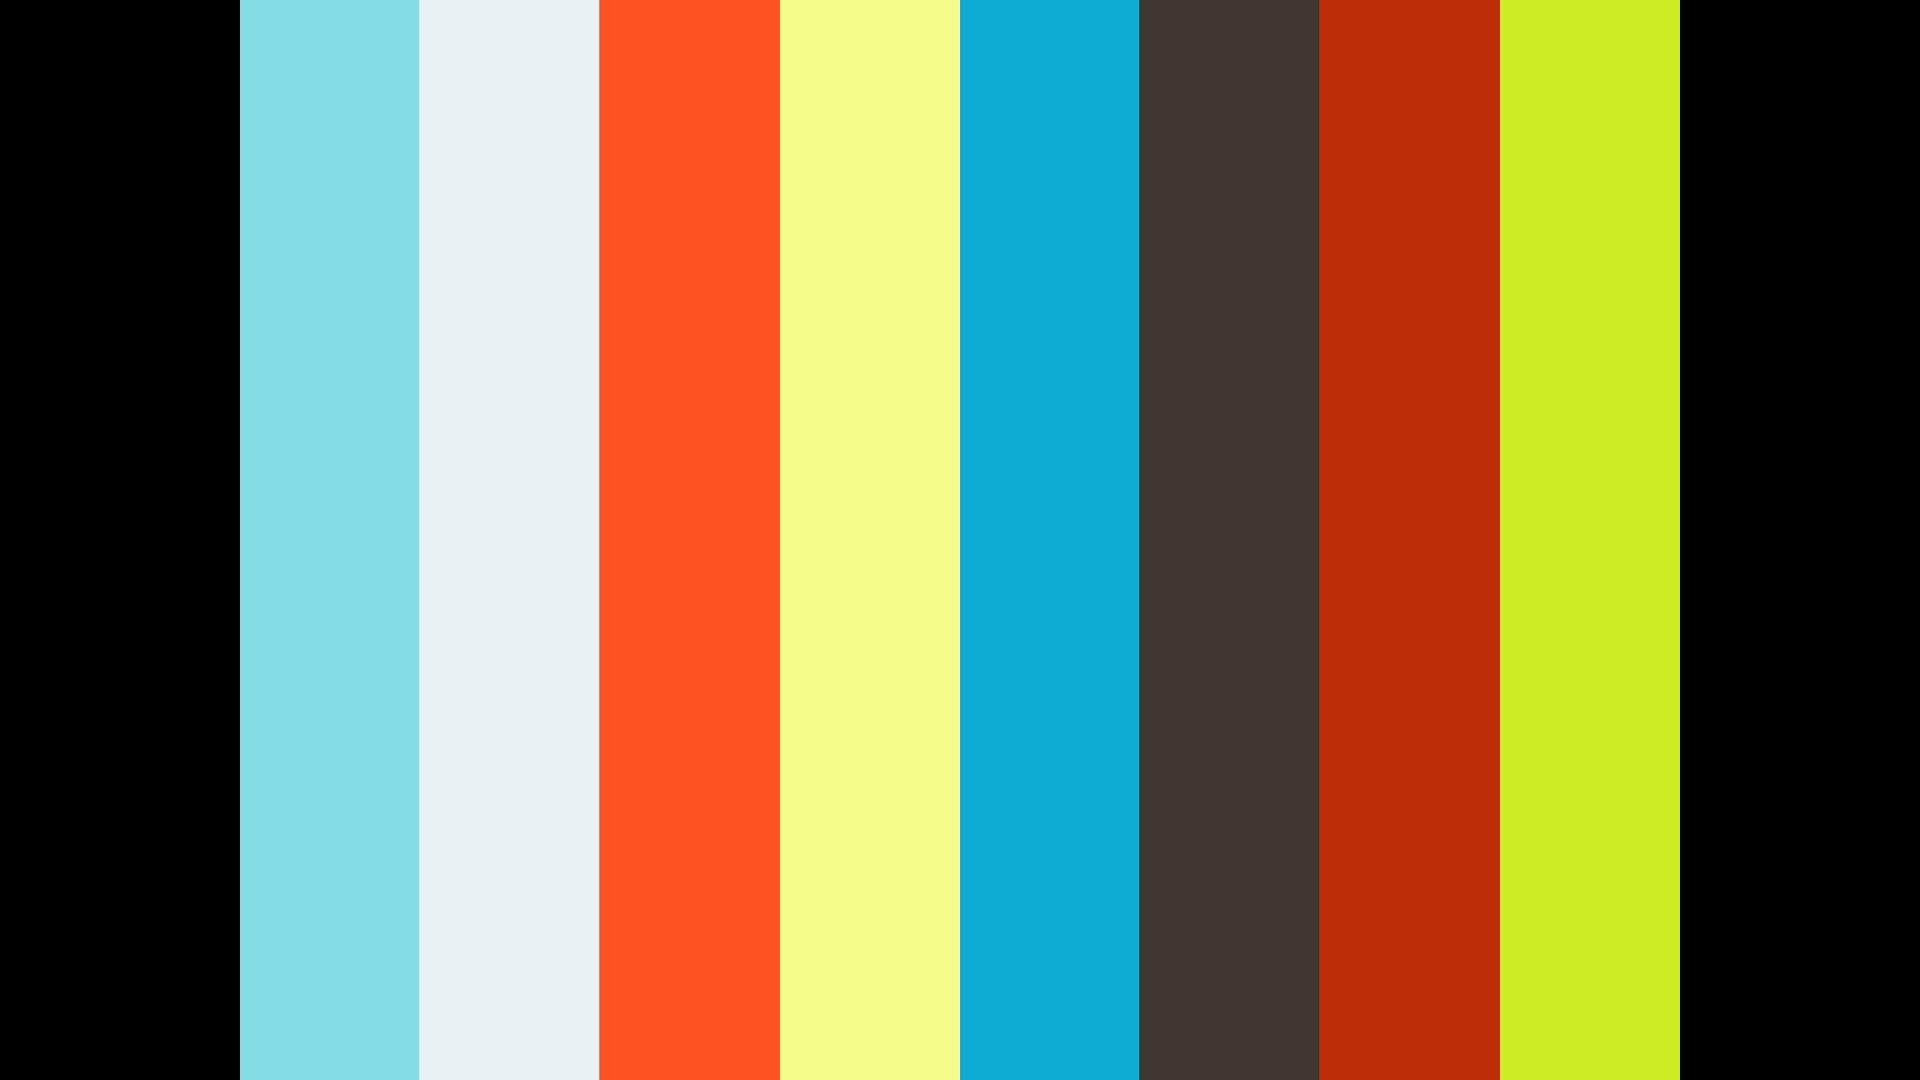 KARANVIR BOHRA & TEEJAY LAUNCH ORGANIC ENERGY BAR CALLED SUPERBARZmp4